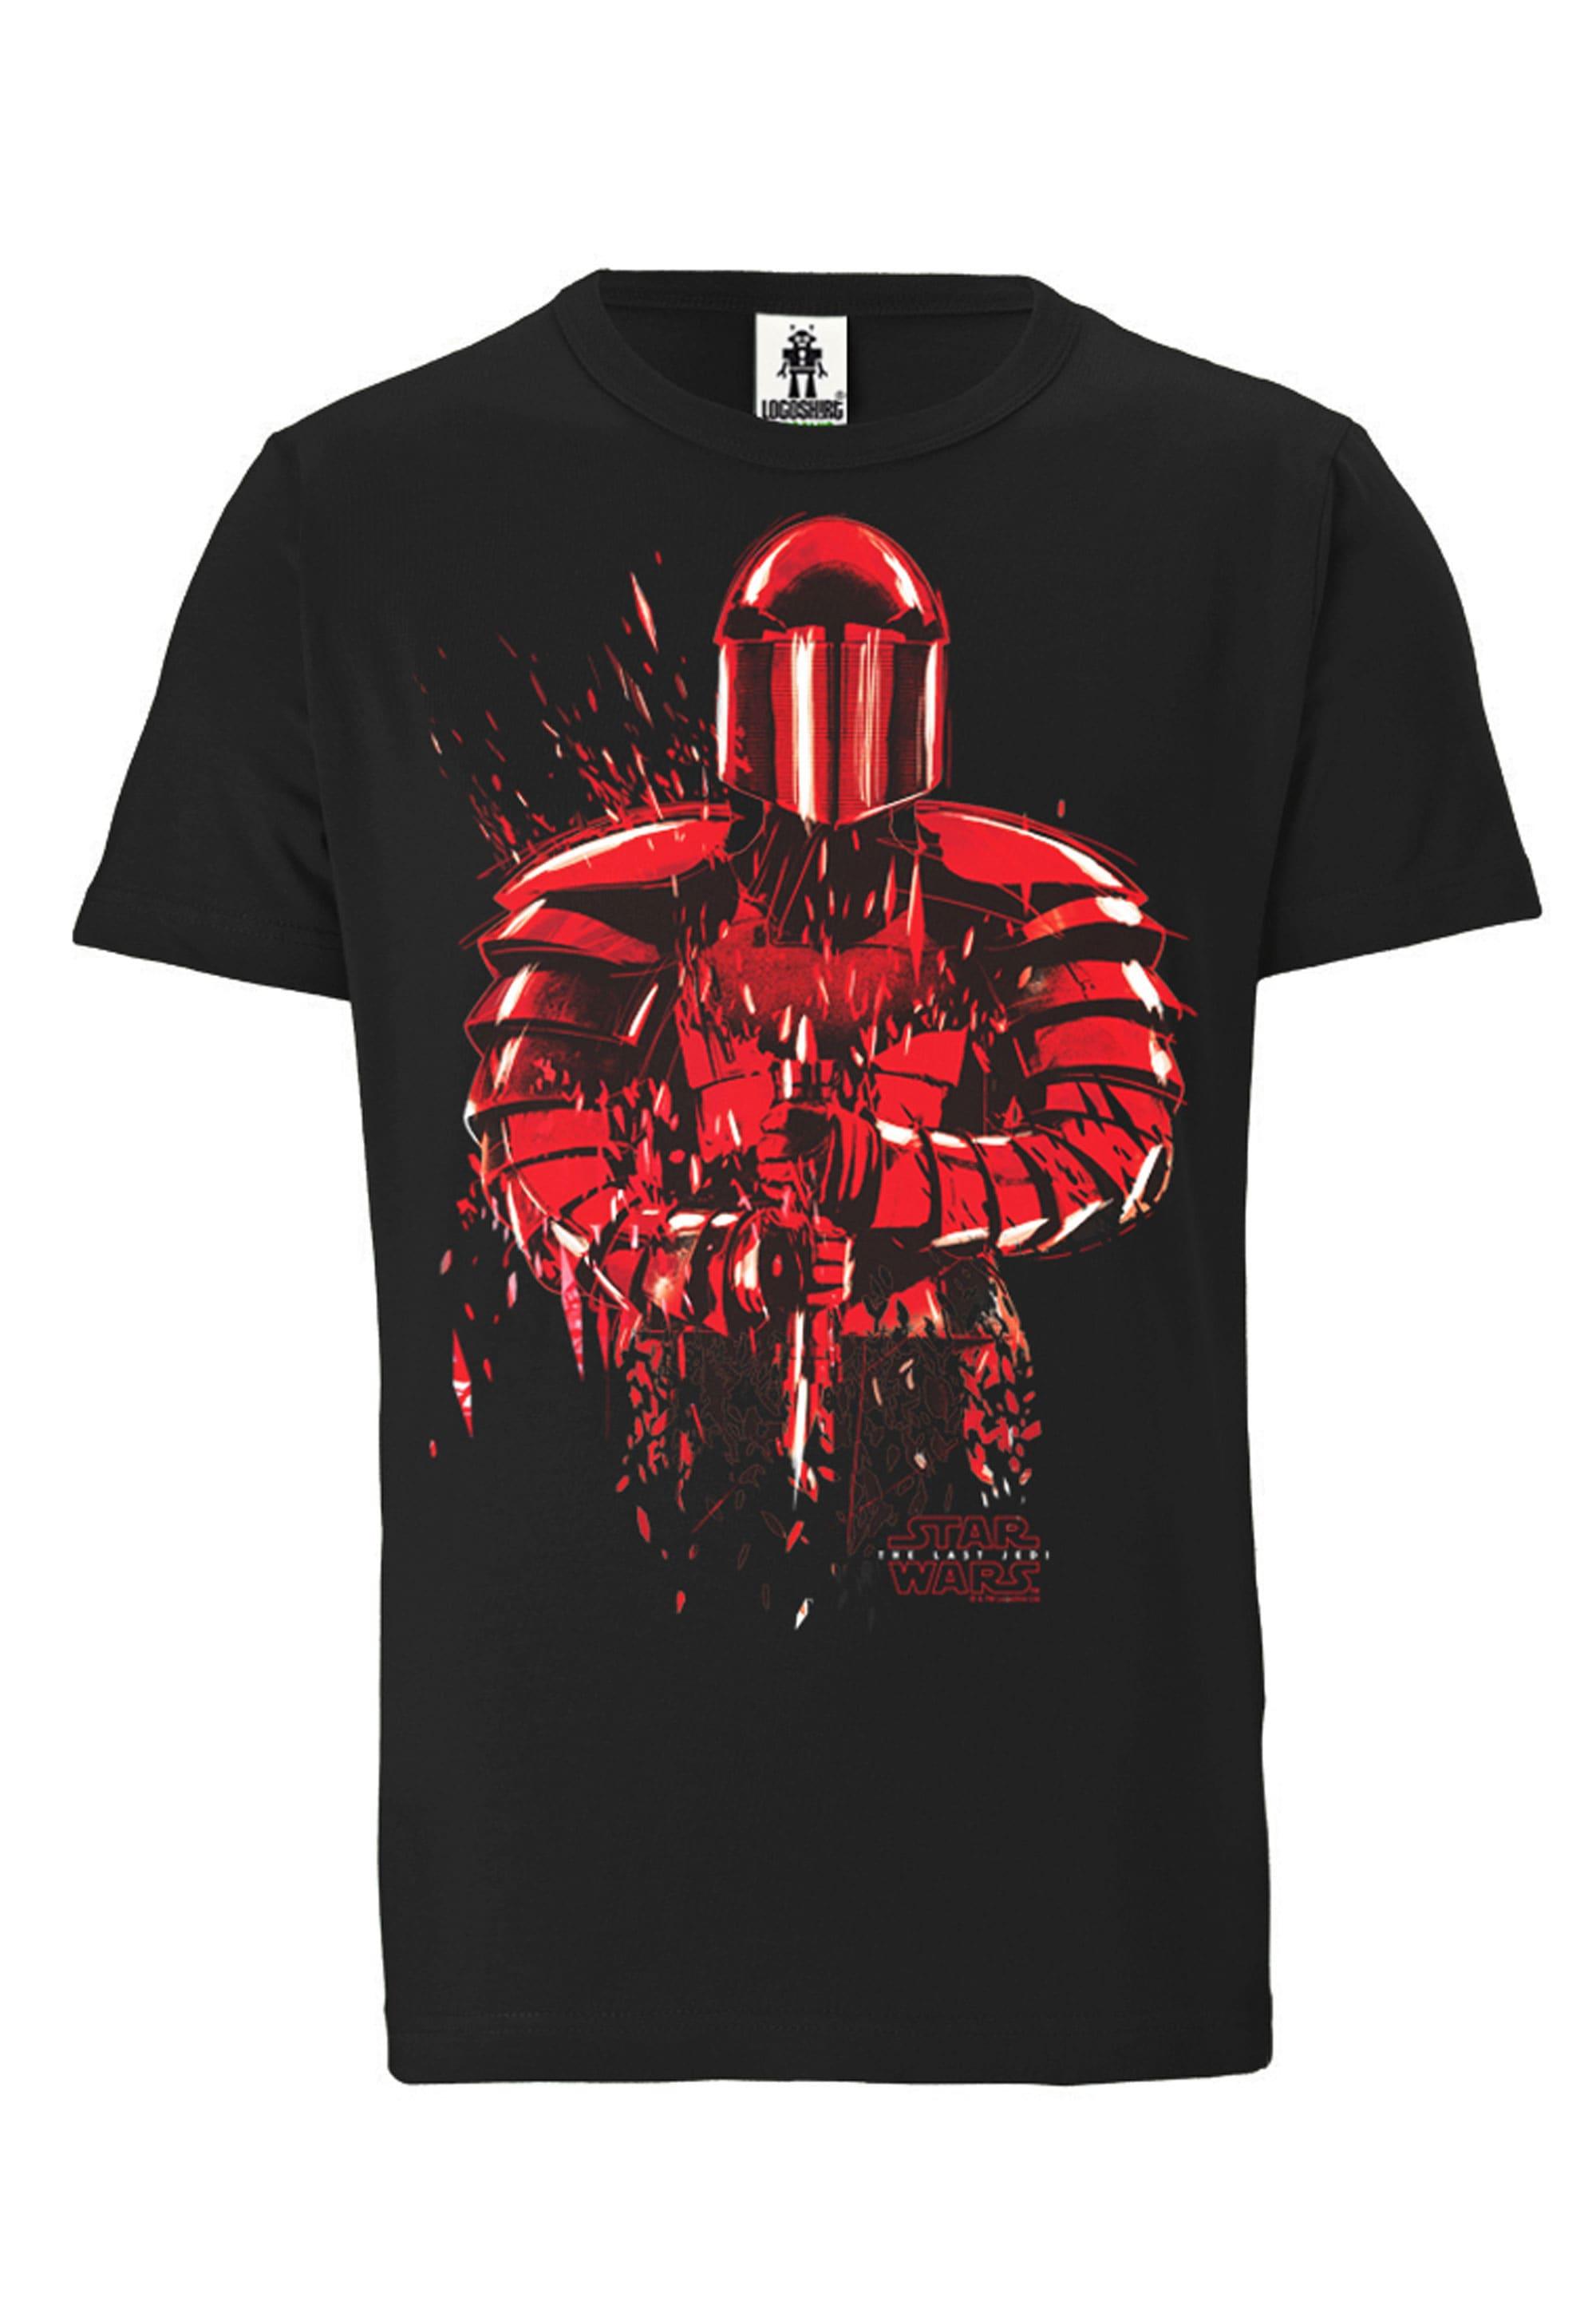 logoshirt -  T-Shirt mit Praetorian Guard-Motiv